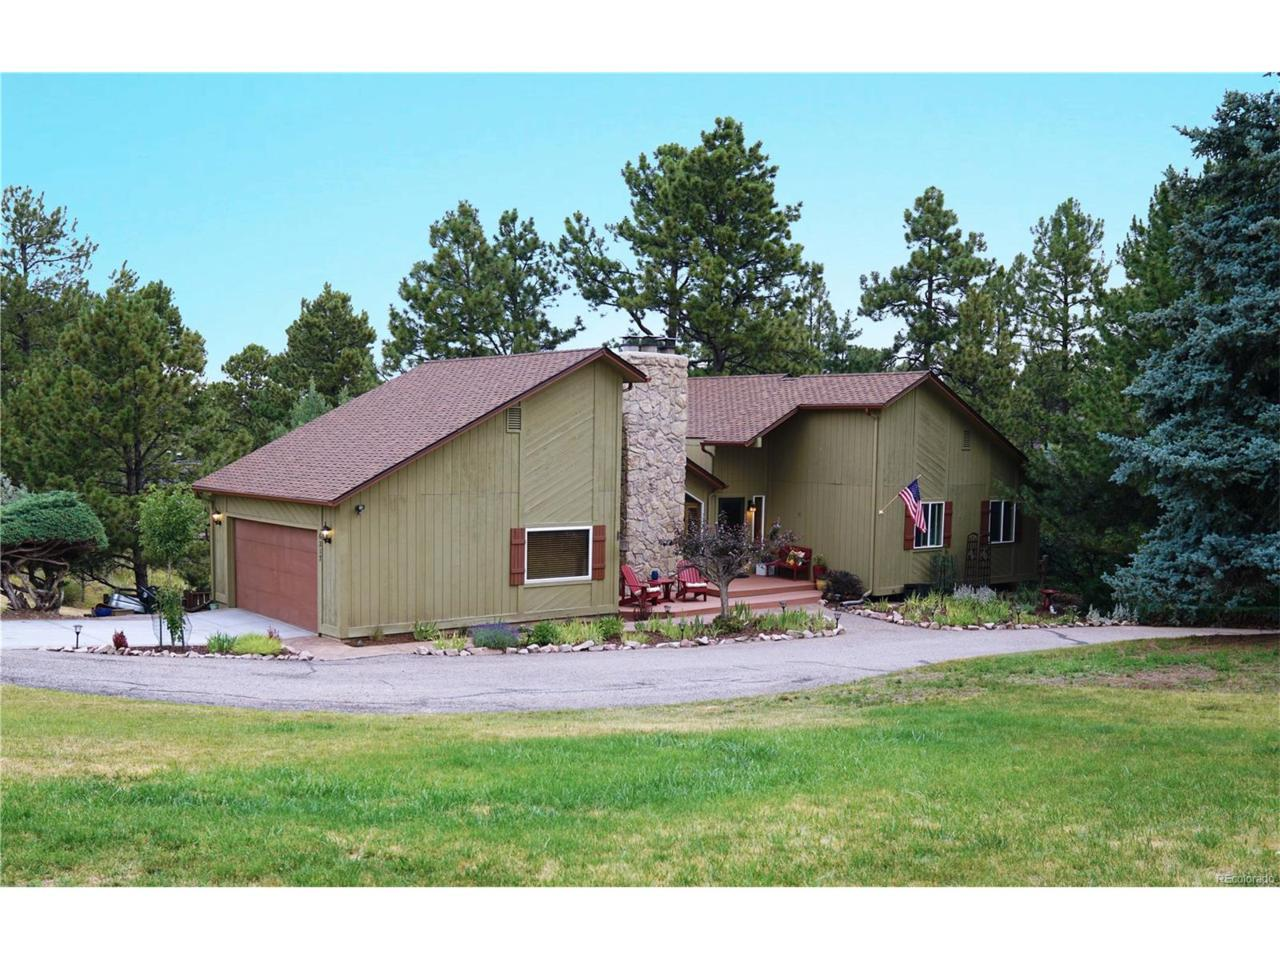 6217 Greely Court, Parker, CO 80134 (MLS #6231831) :: 8z Real Estate